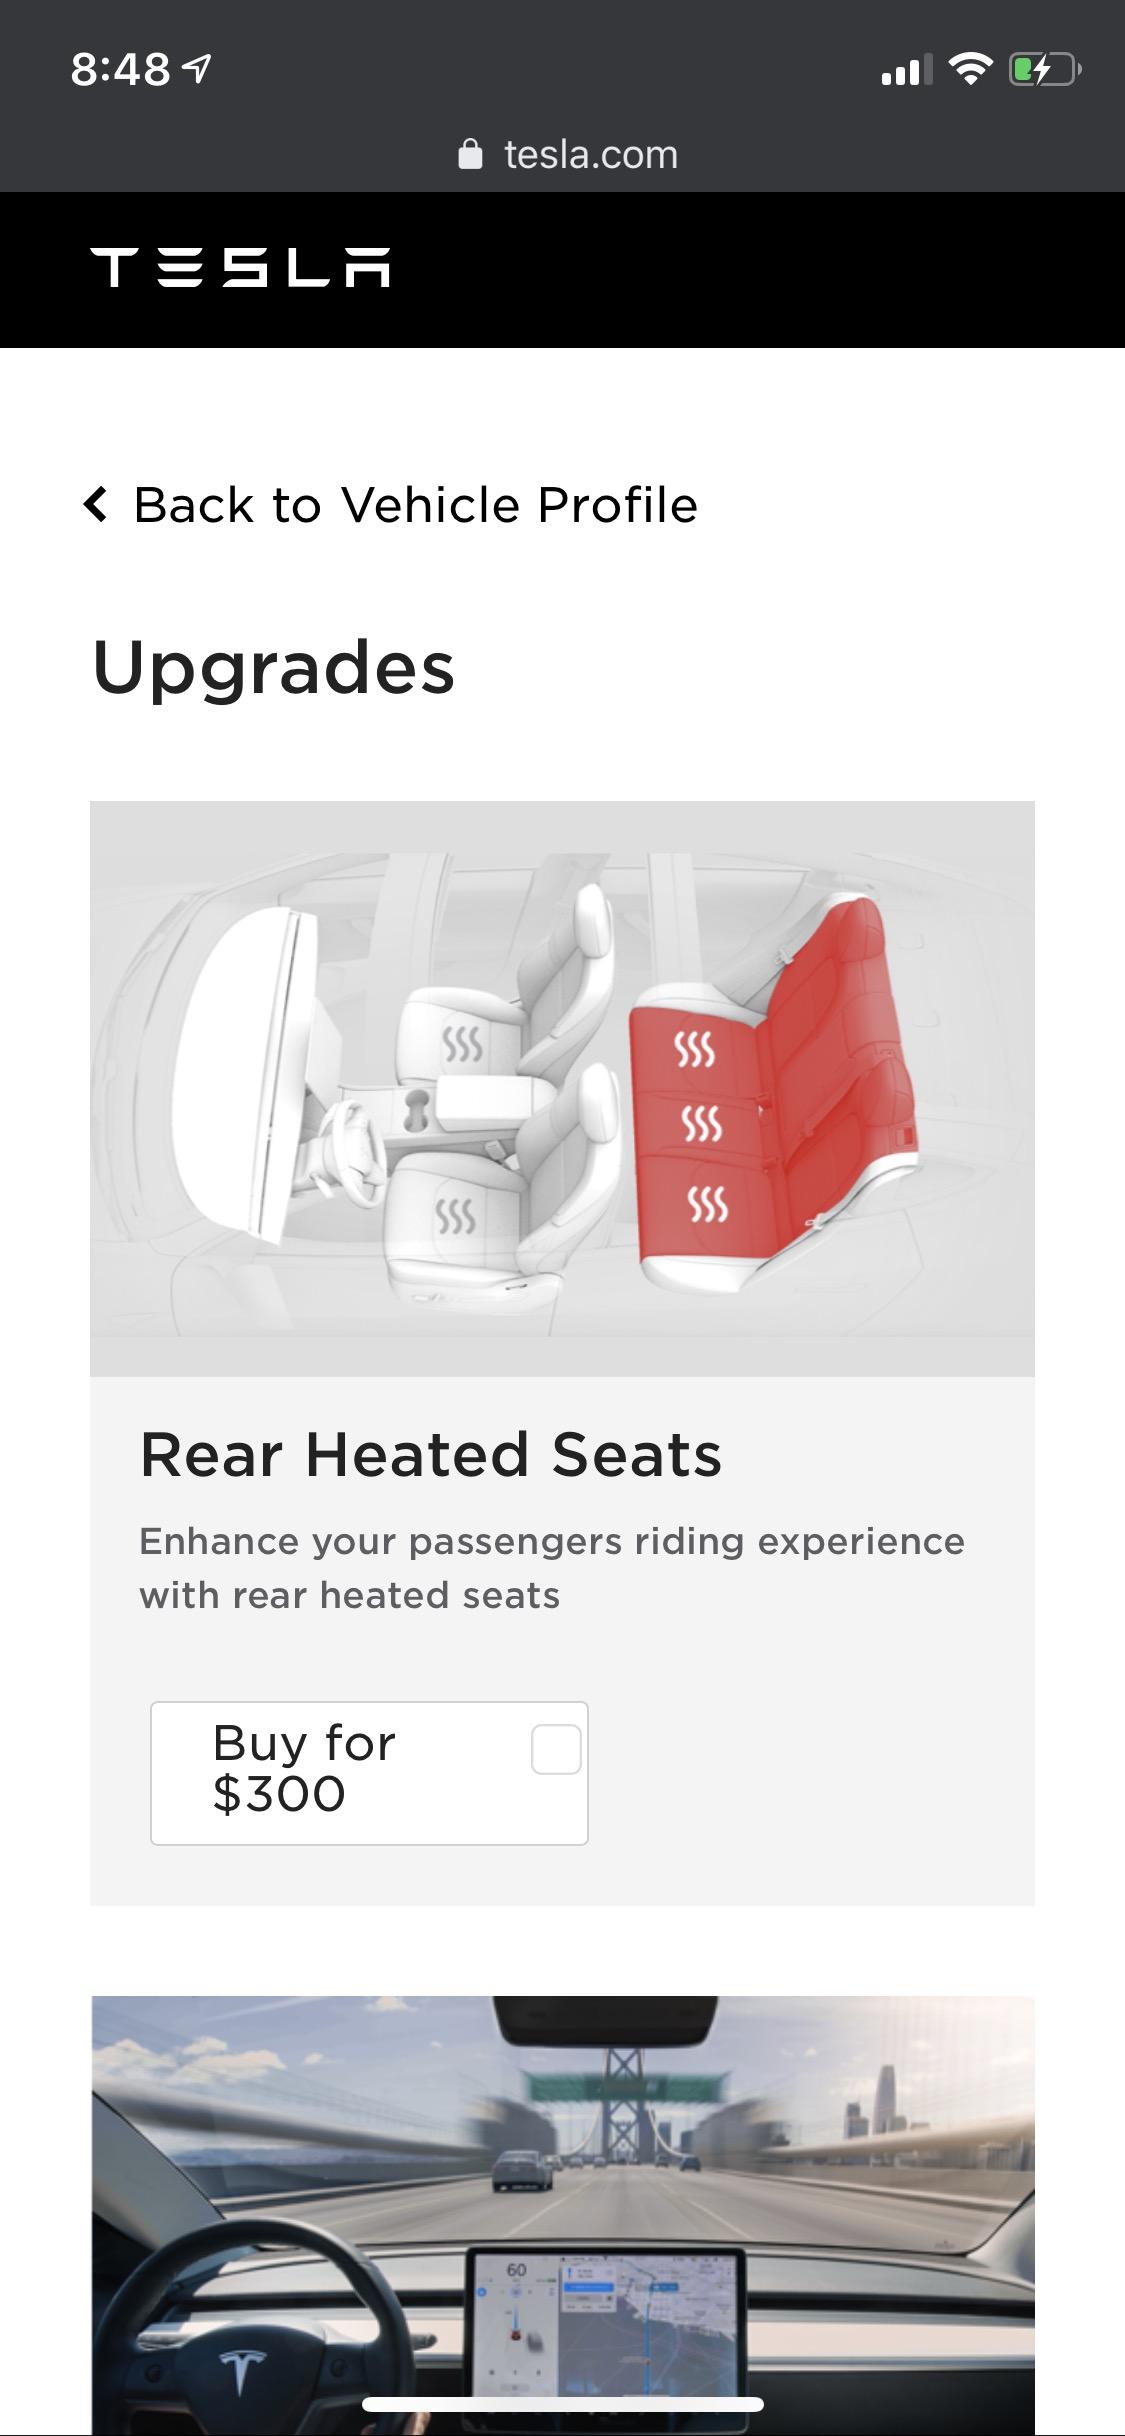 tesla-rear-heated-seats-option-app